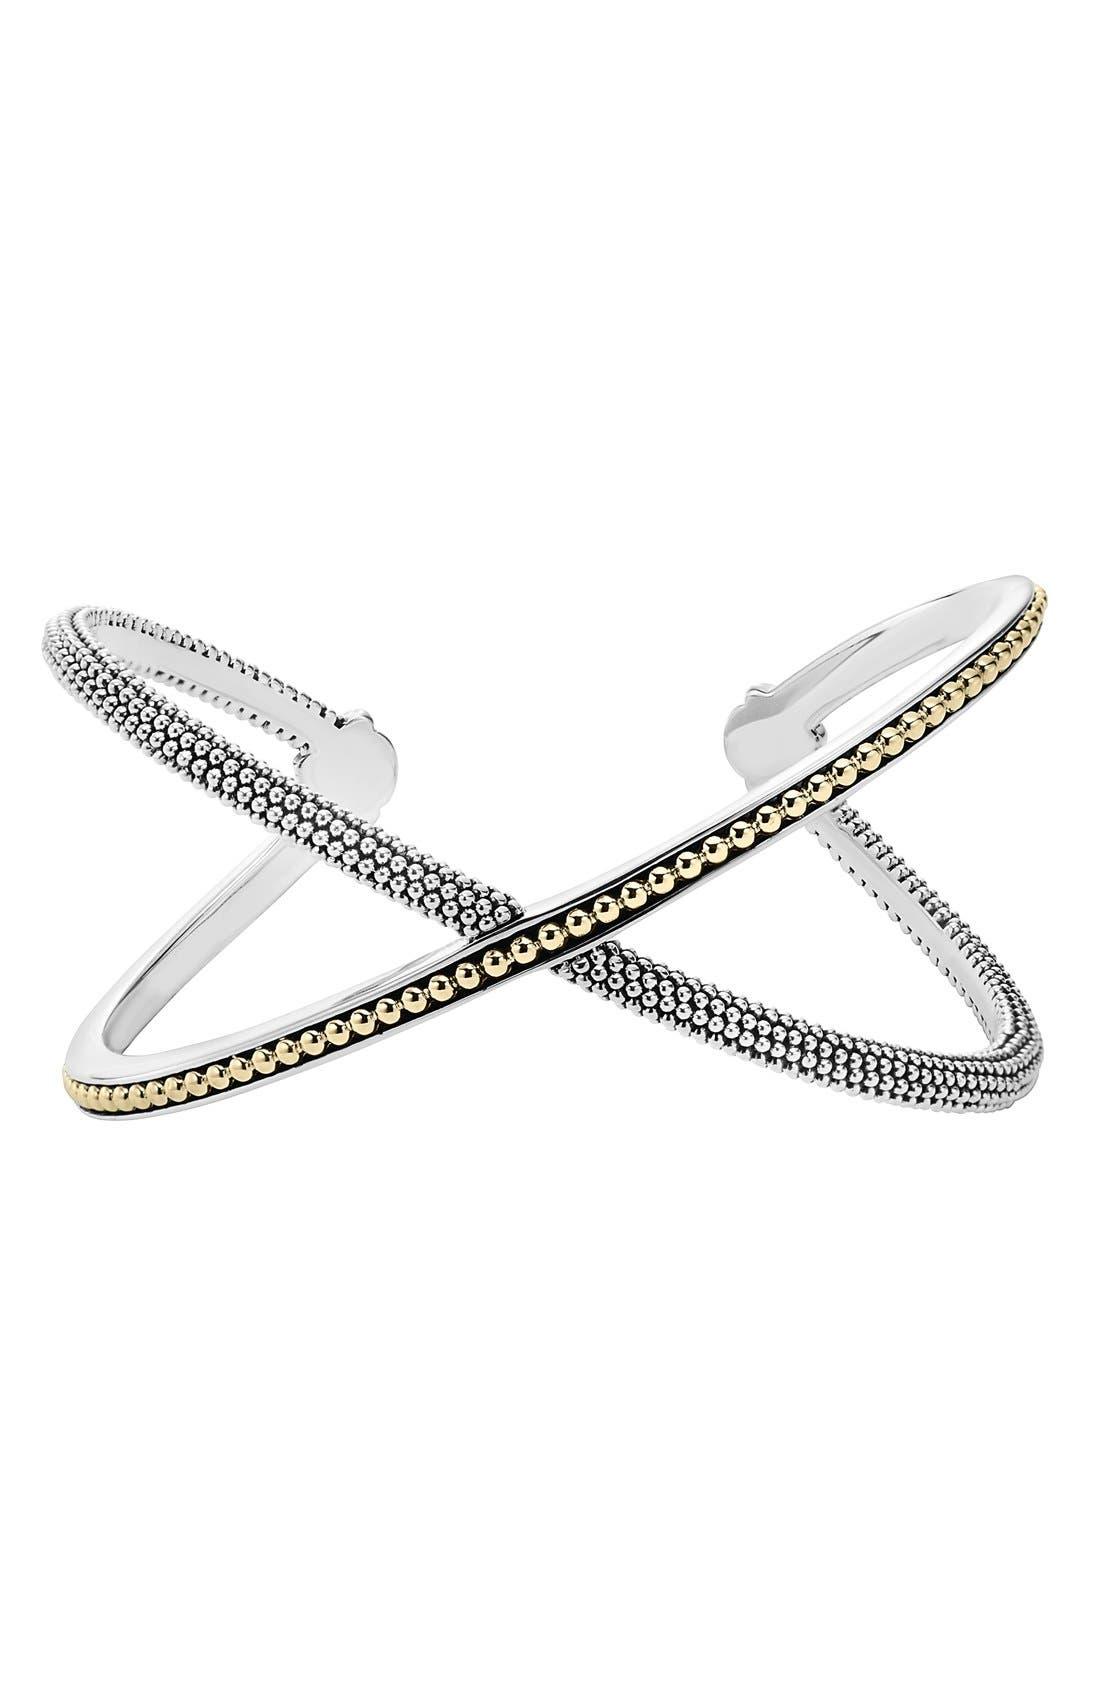 Main Image - LAGOS Infinity Cuff Bracelet